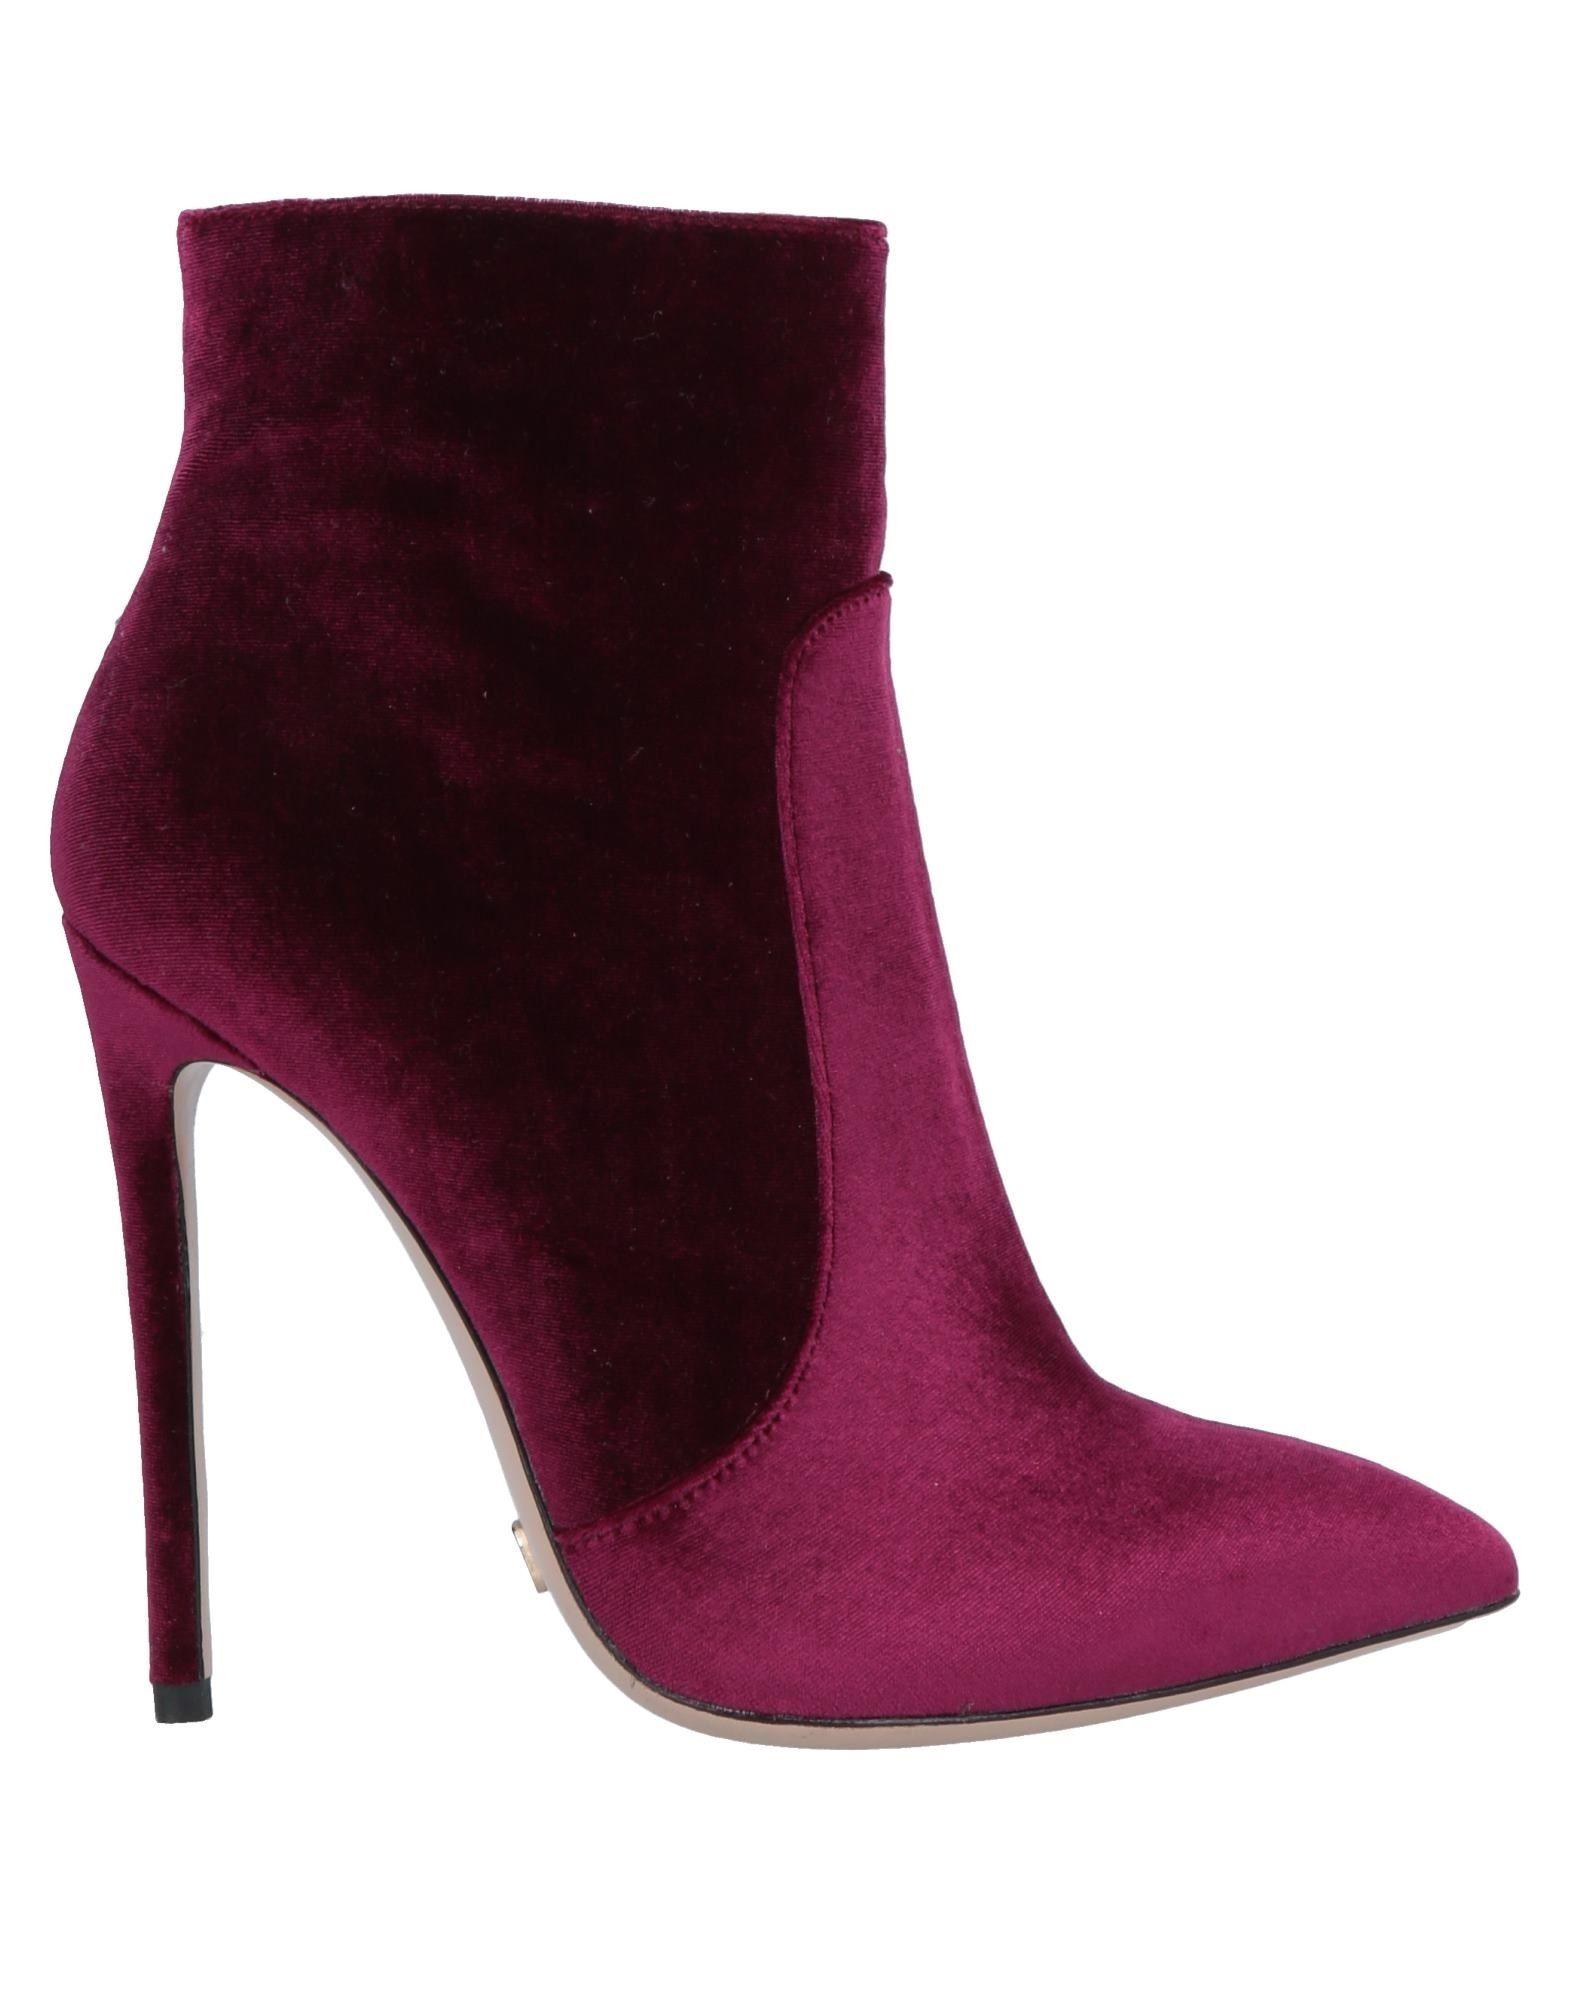 Stivaletti Gianni Renzi®  Couture donna - 11605606SM 11605606SM 11605606SM ff6